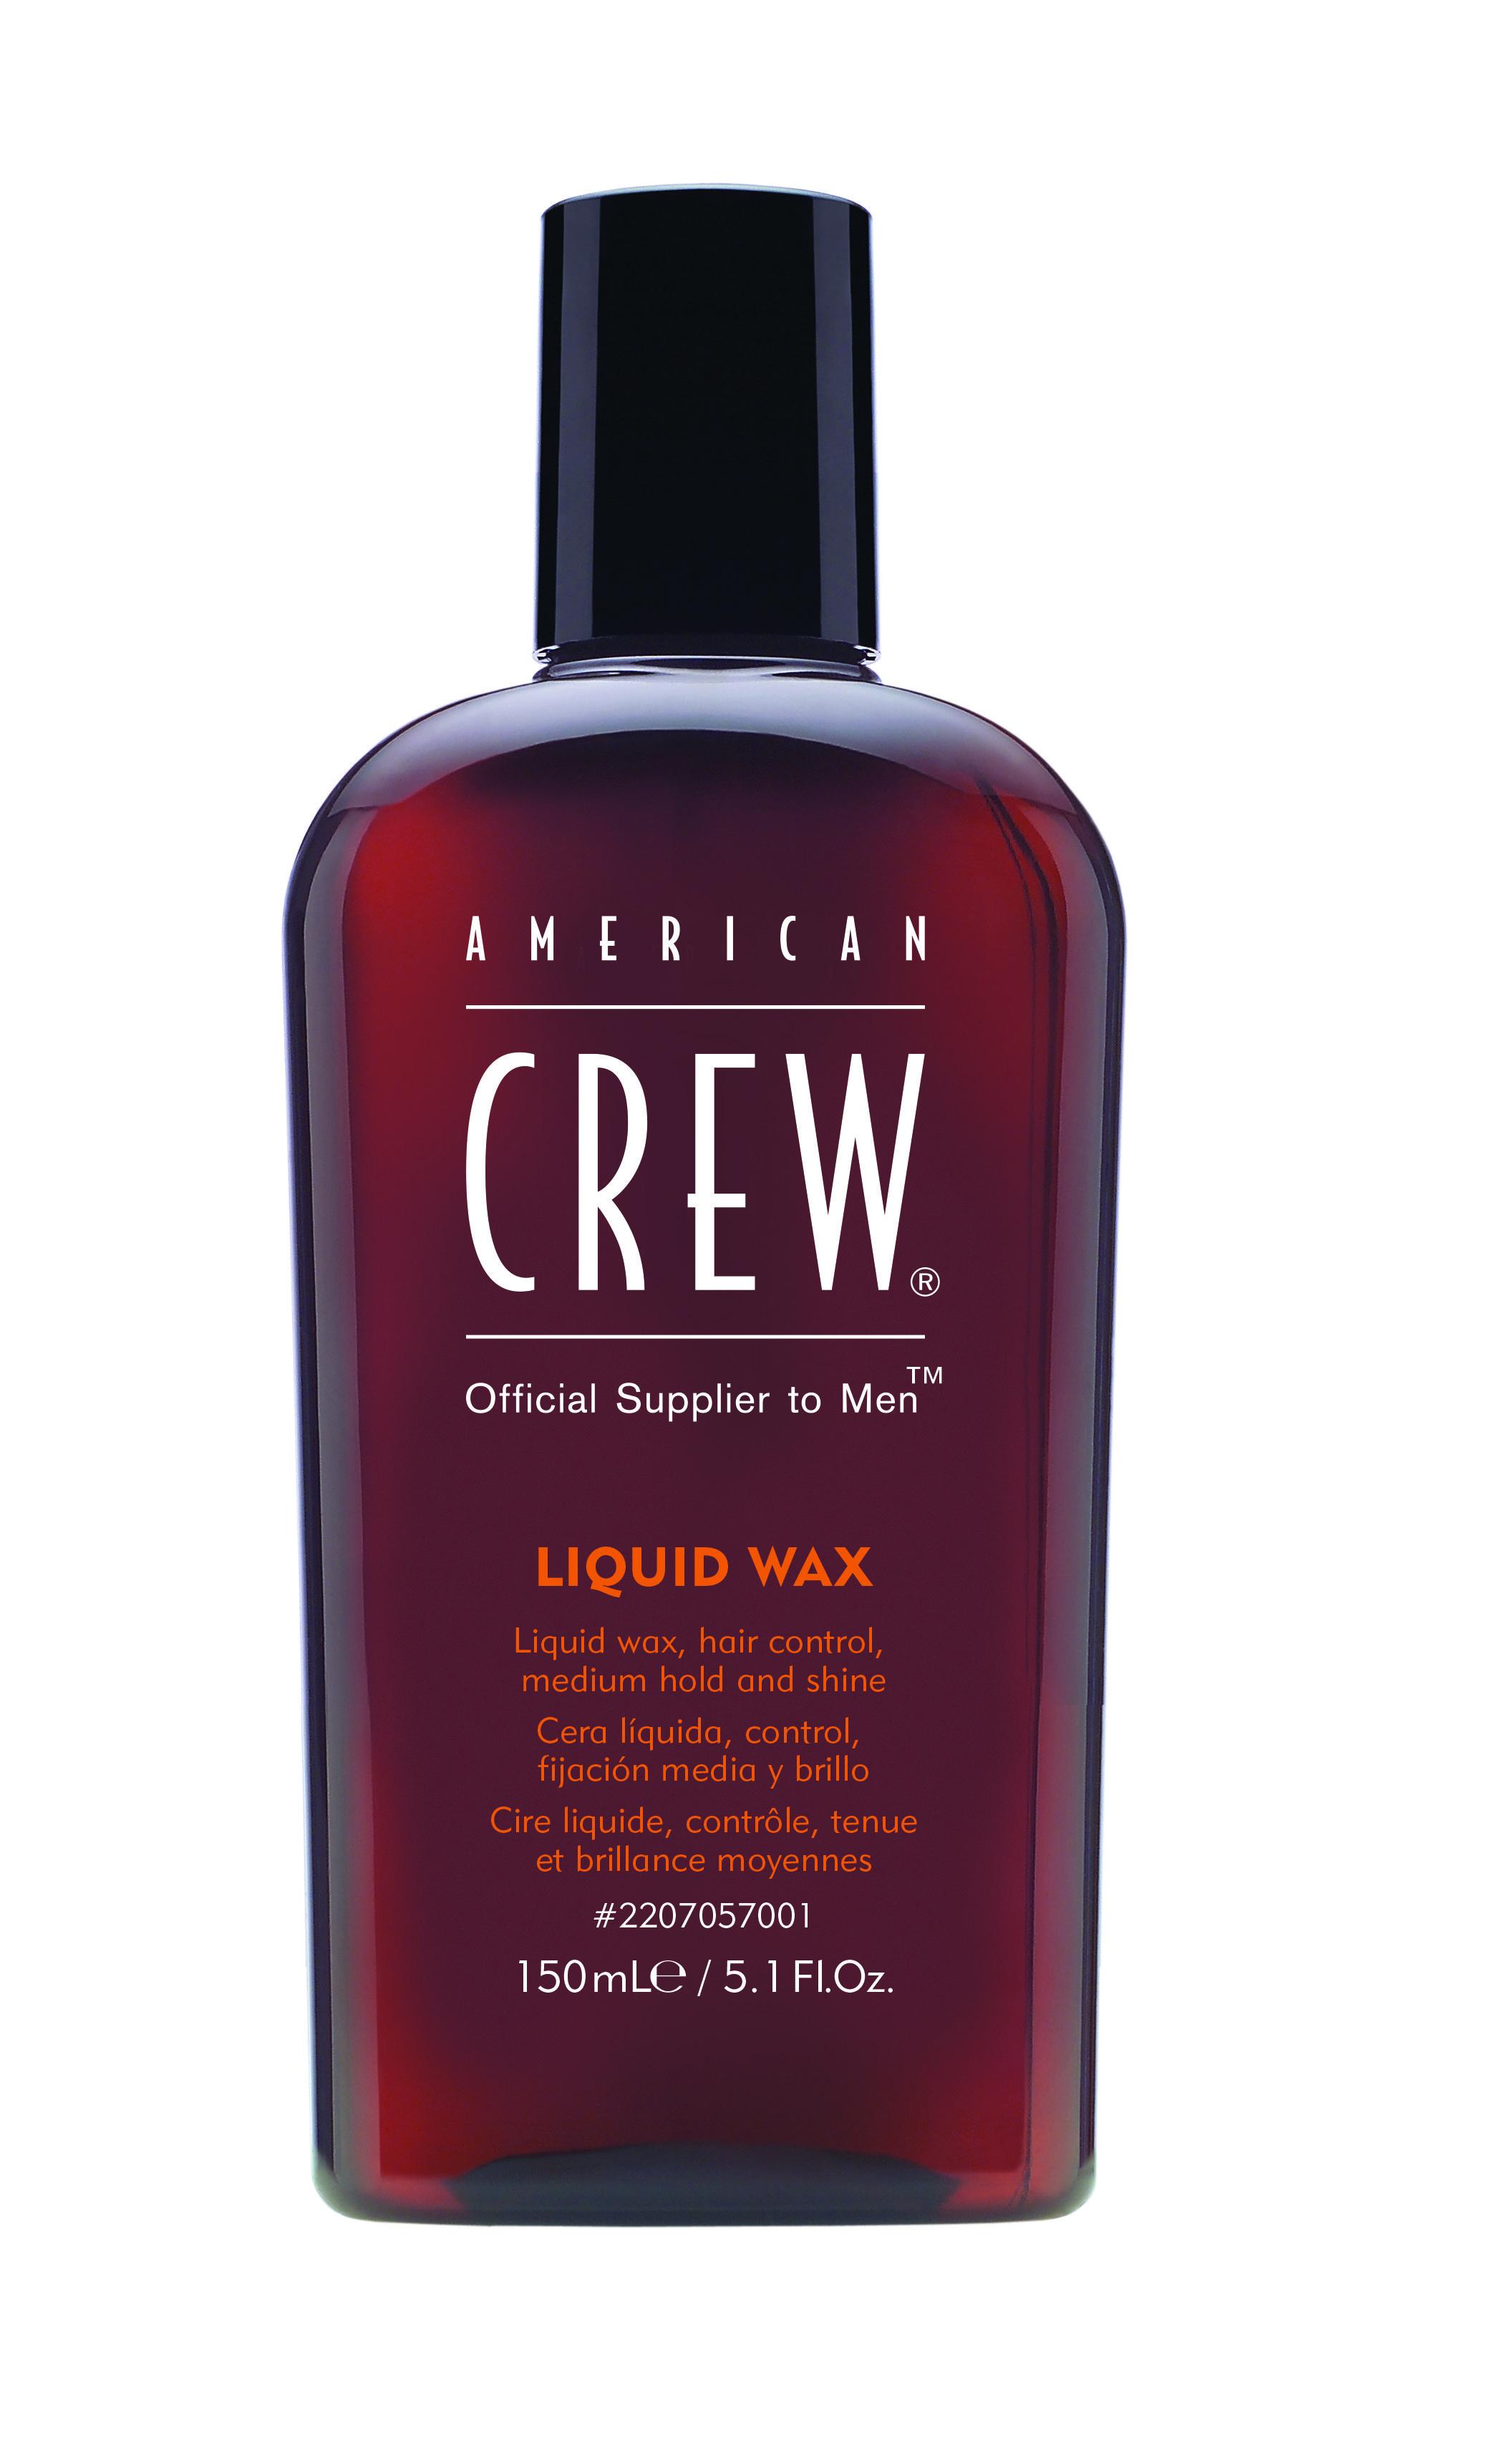 American crew liquid wax 150ml american crew